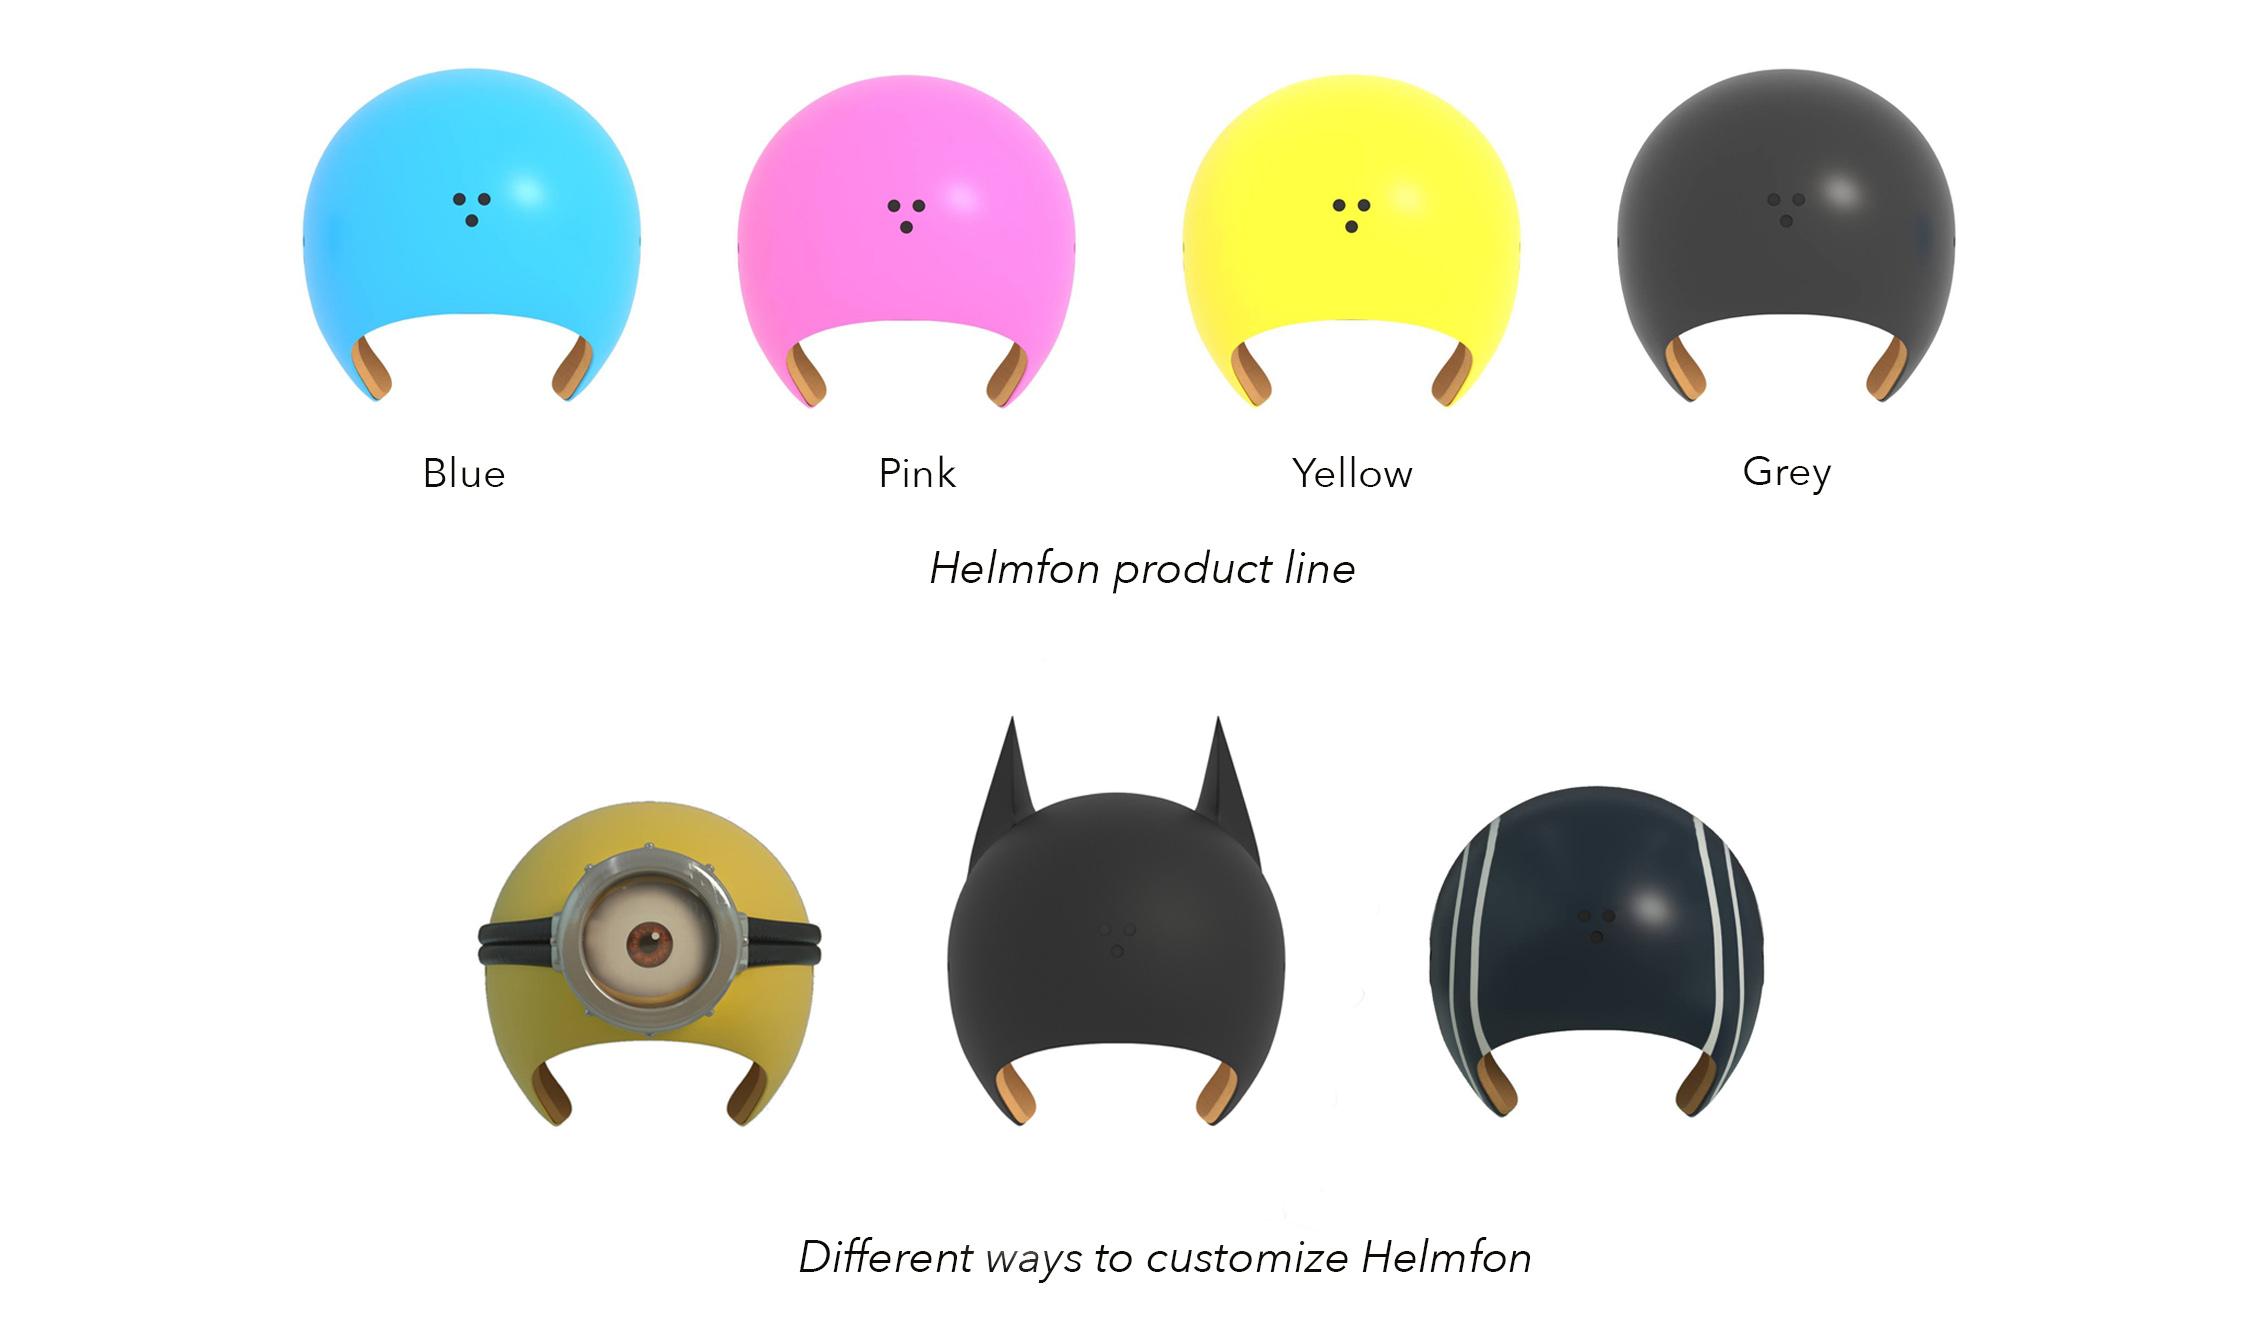 Helmfon